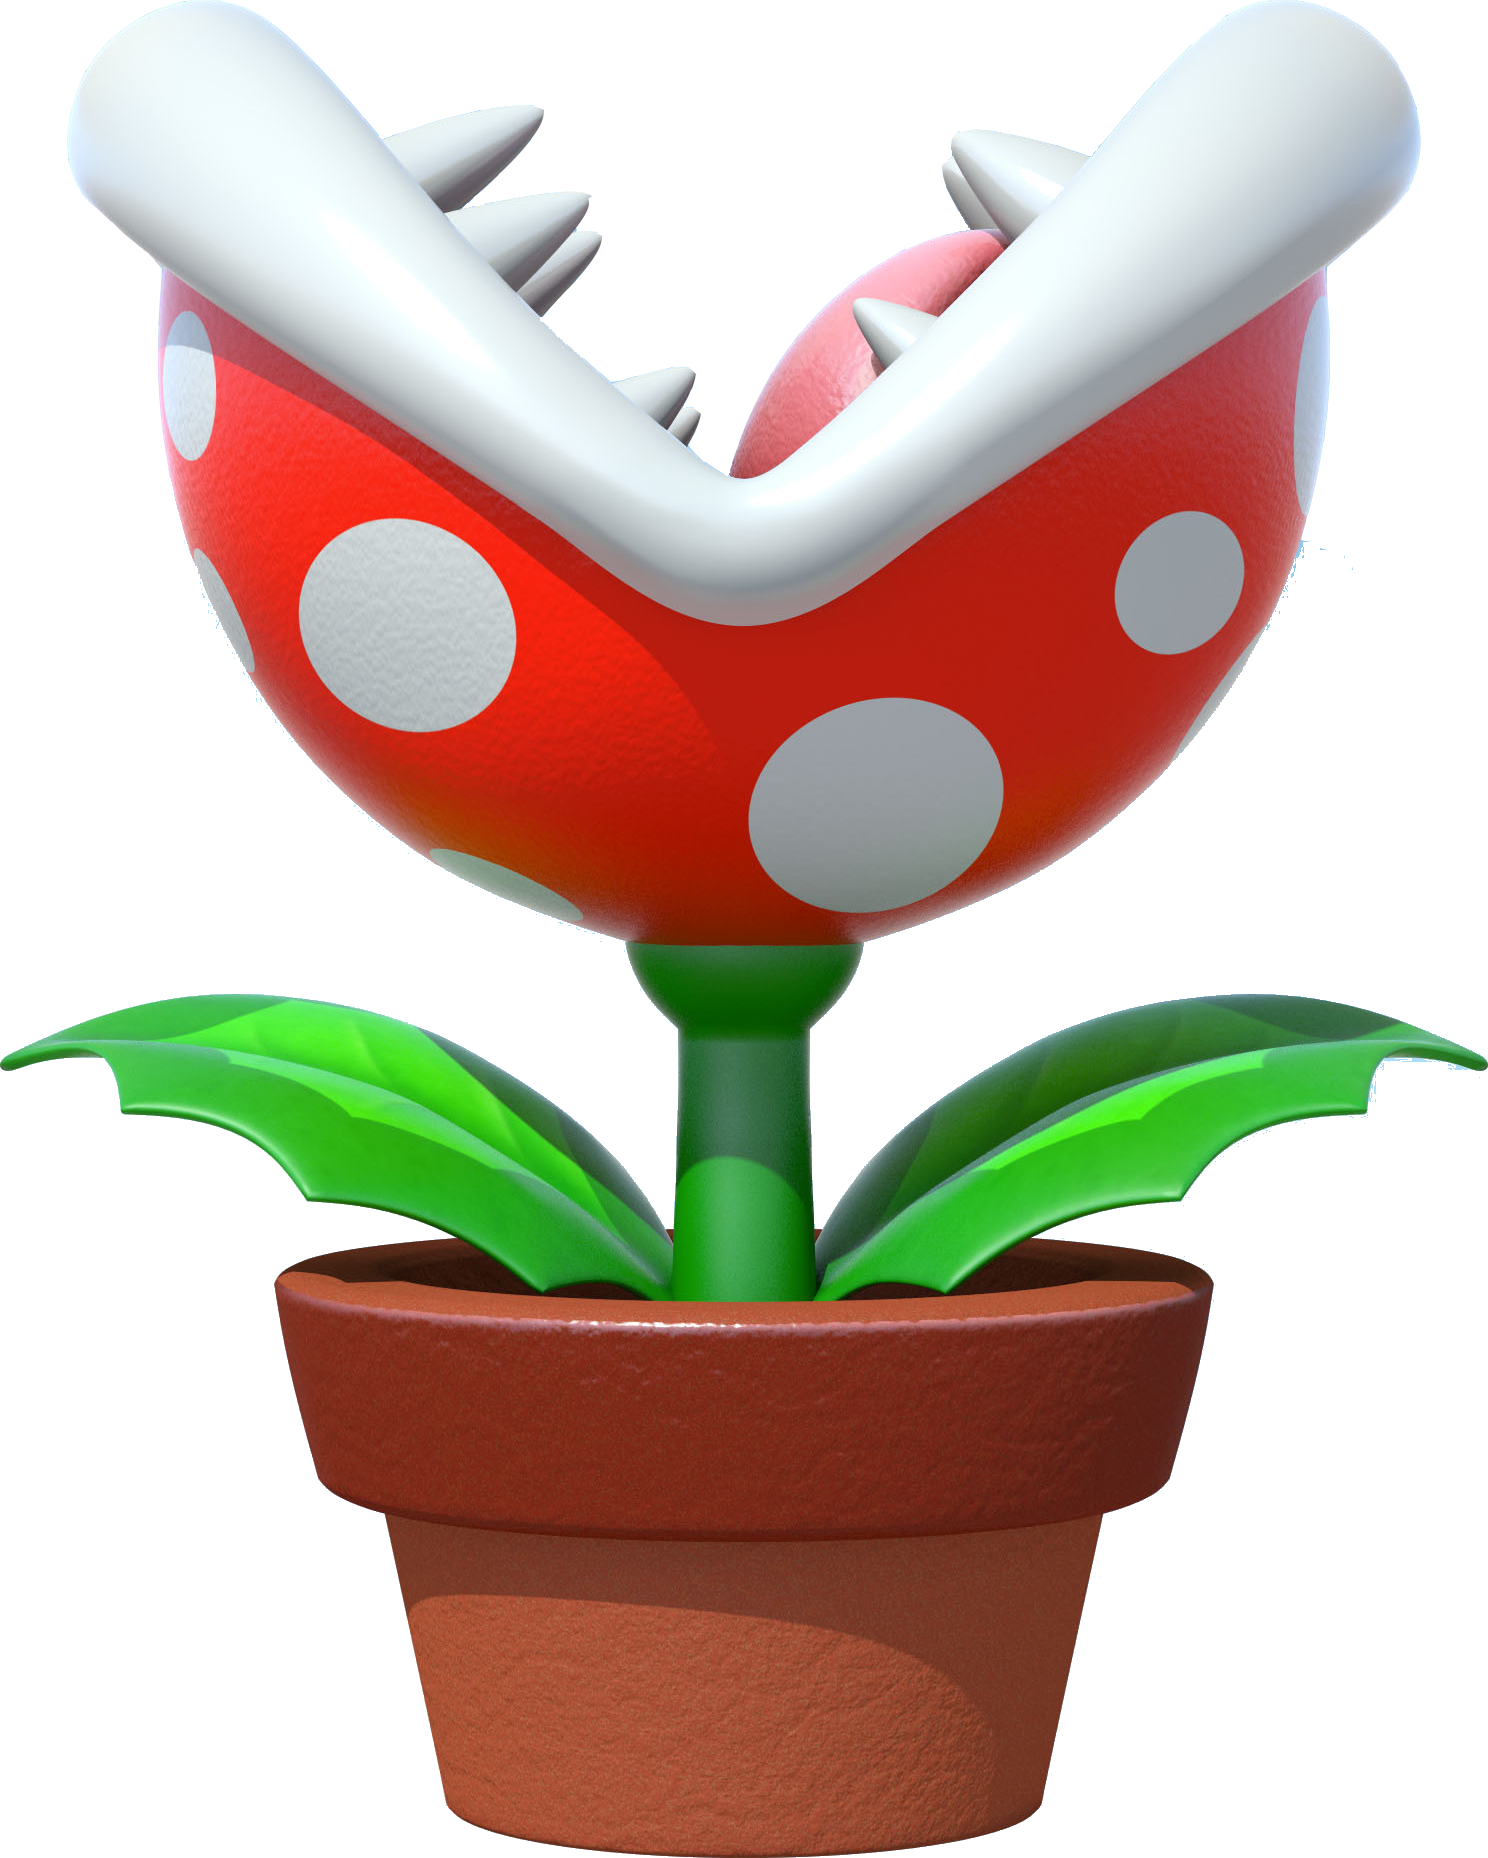 potted piranha plant mario kart racing wiki fandom powered by